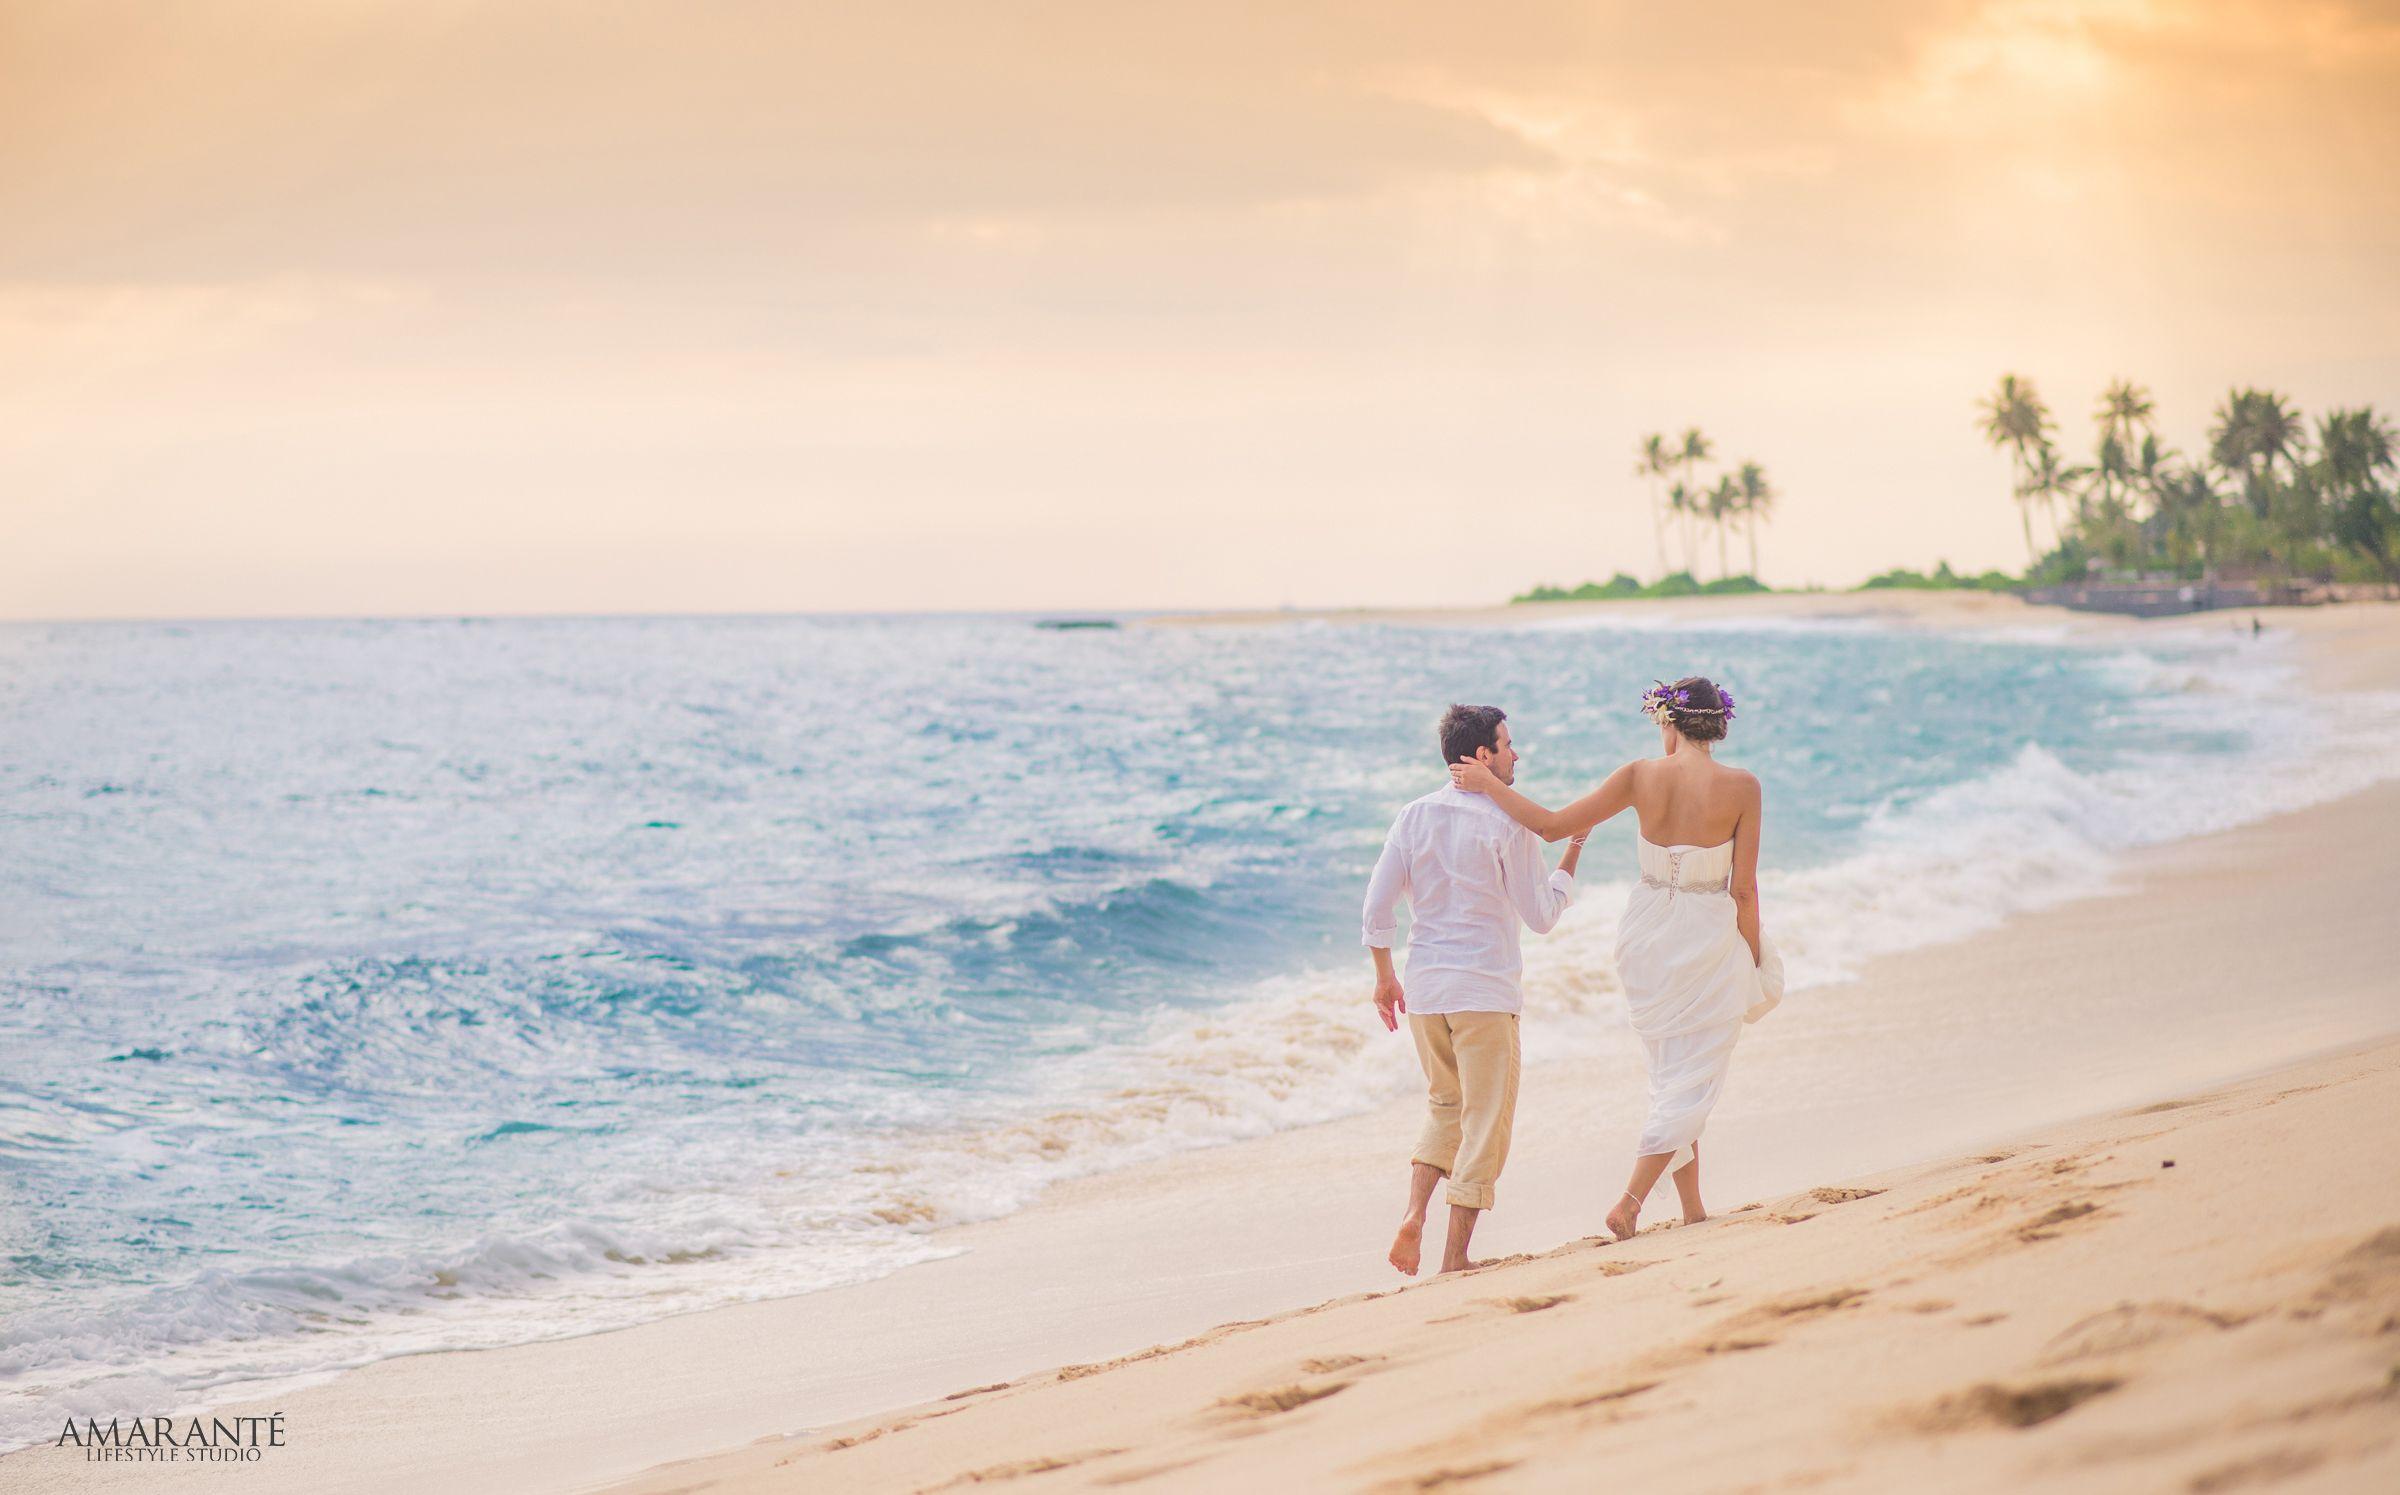 Lea & Igor <3 #amarantelifestyle #destinationweddings #weddingsinsrilanka #beachweddings #marrymebarefoot #travelcouple #gallesrilanka #mirissa #srilanka